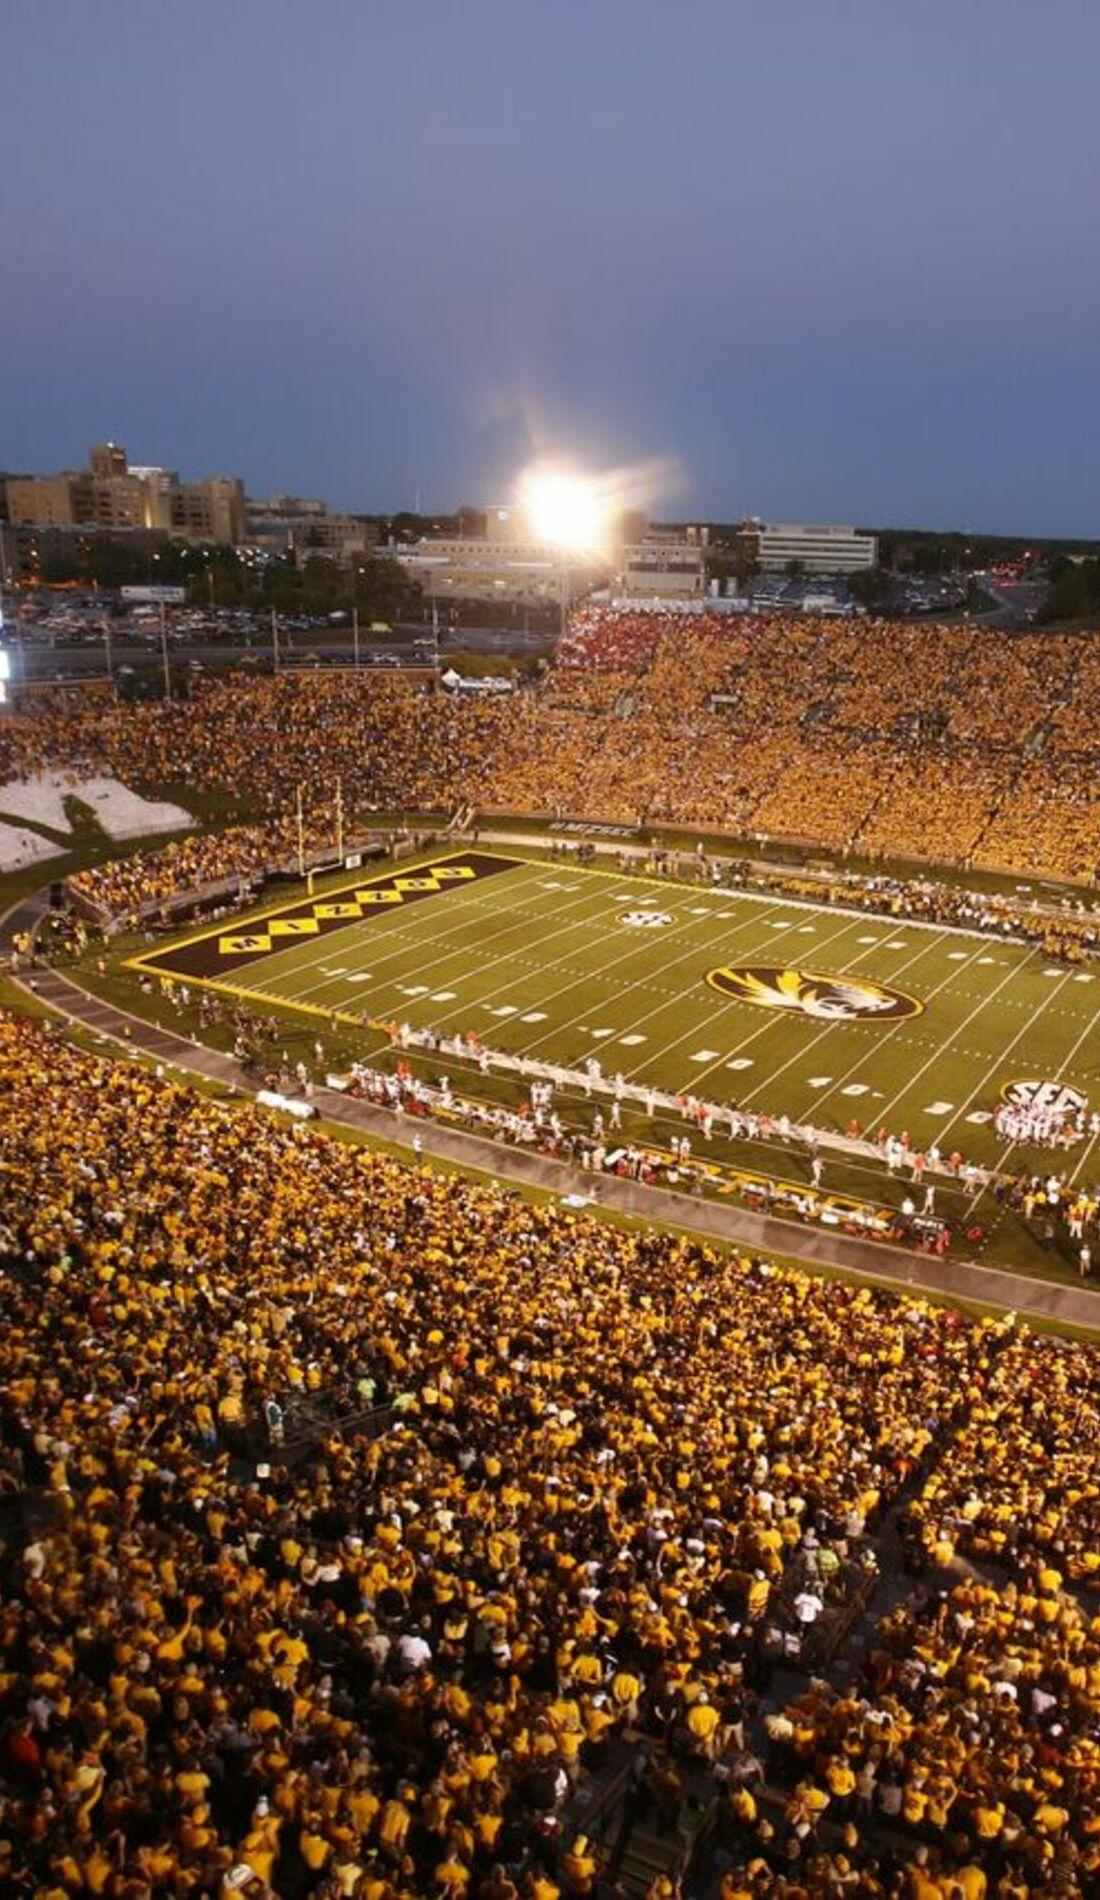 A Missouri Tigers Football live event